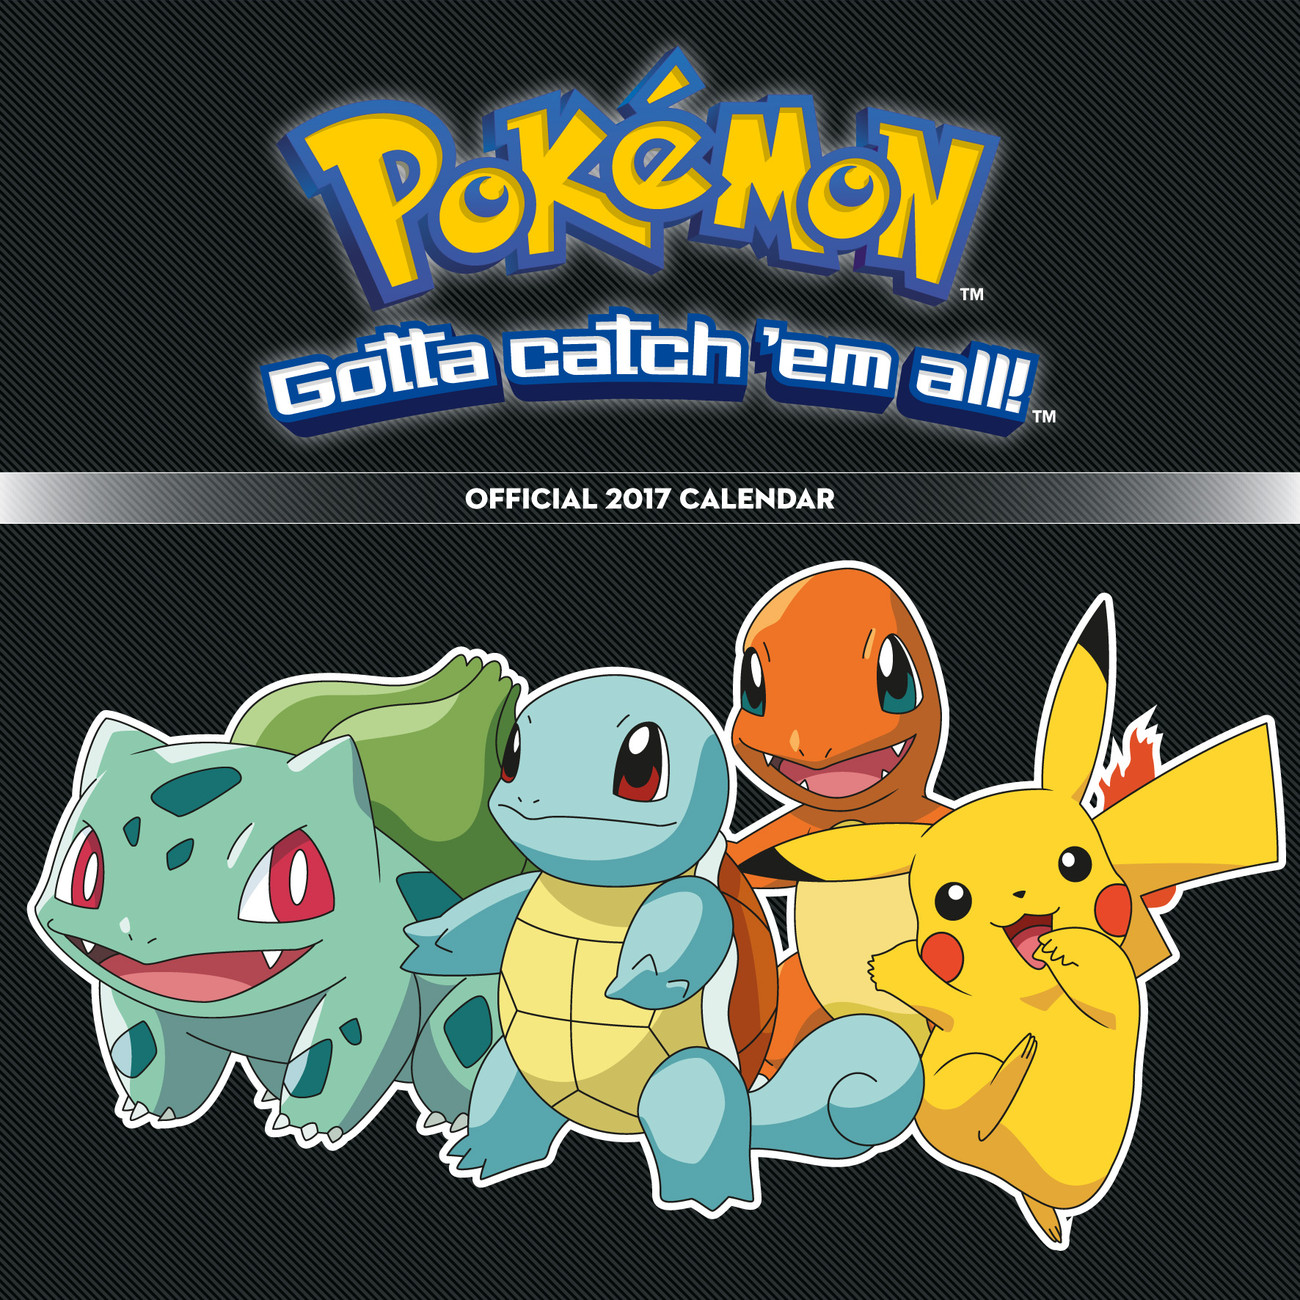 2020 Pokemon Calendar Pokemon   Calendars 2020 on UKposters/Abposters.com